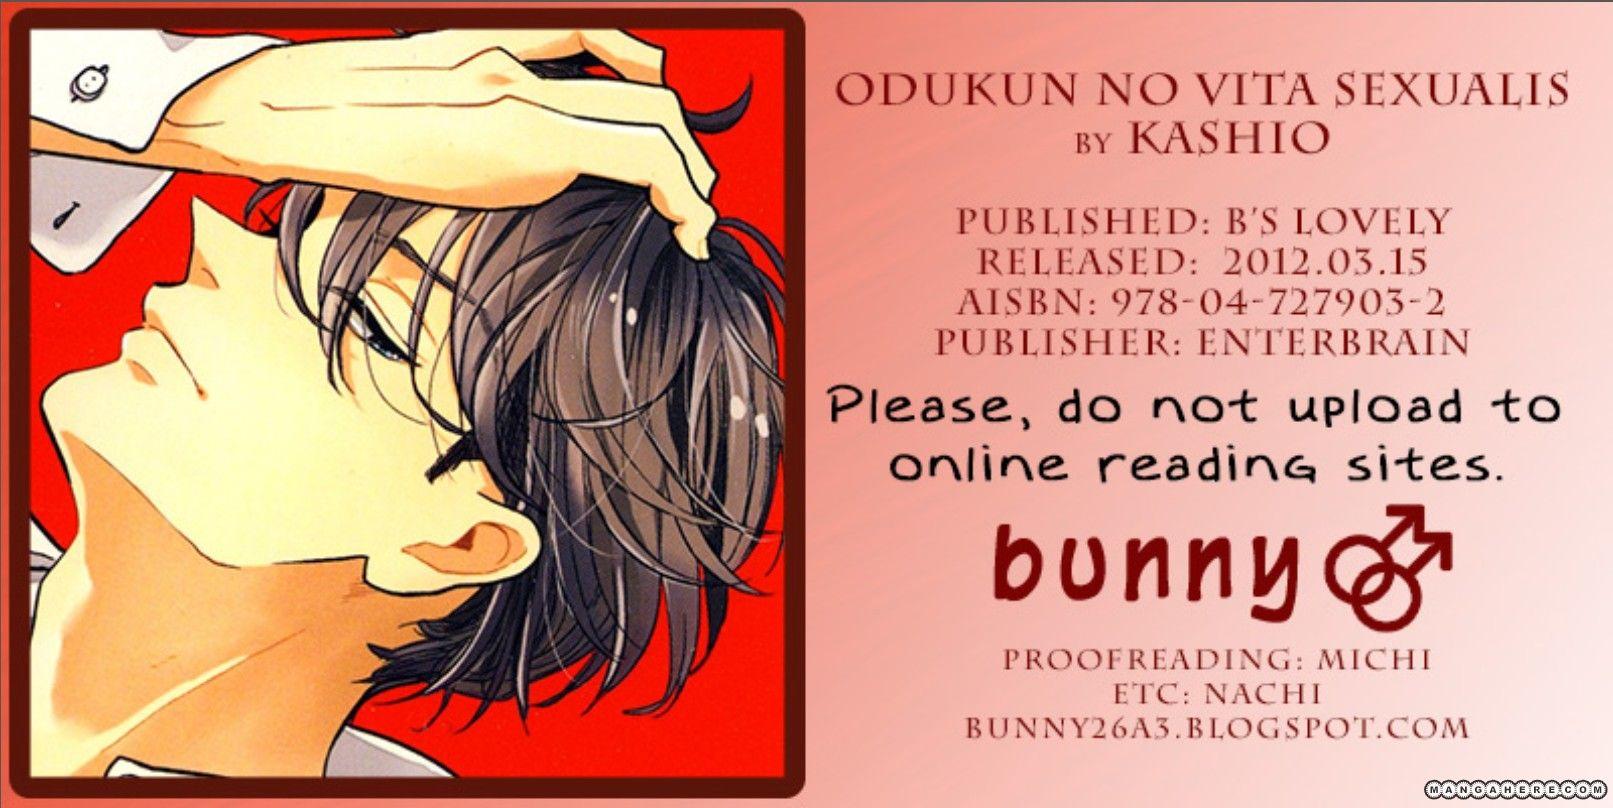 Odu-kun no Vita Sexualis 3.2 Page 1